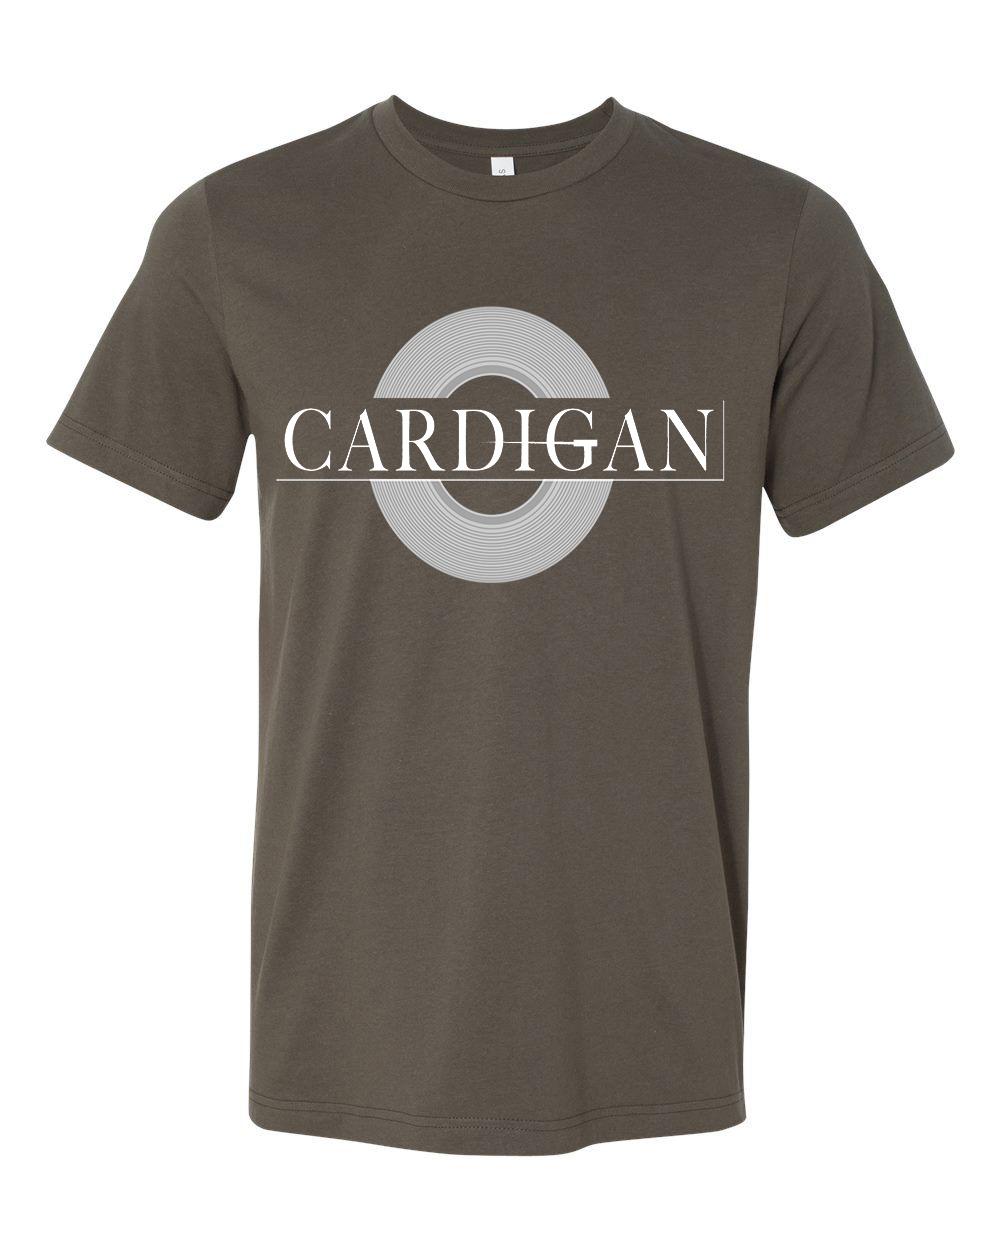 Cardigan Records - Anniversary T-Shirt